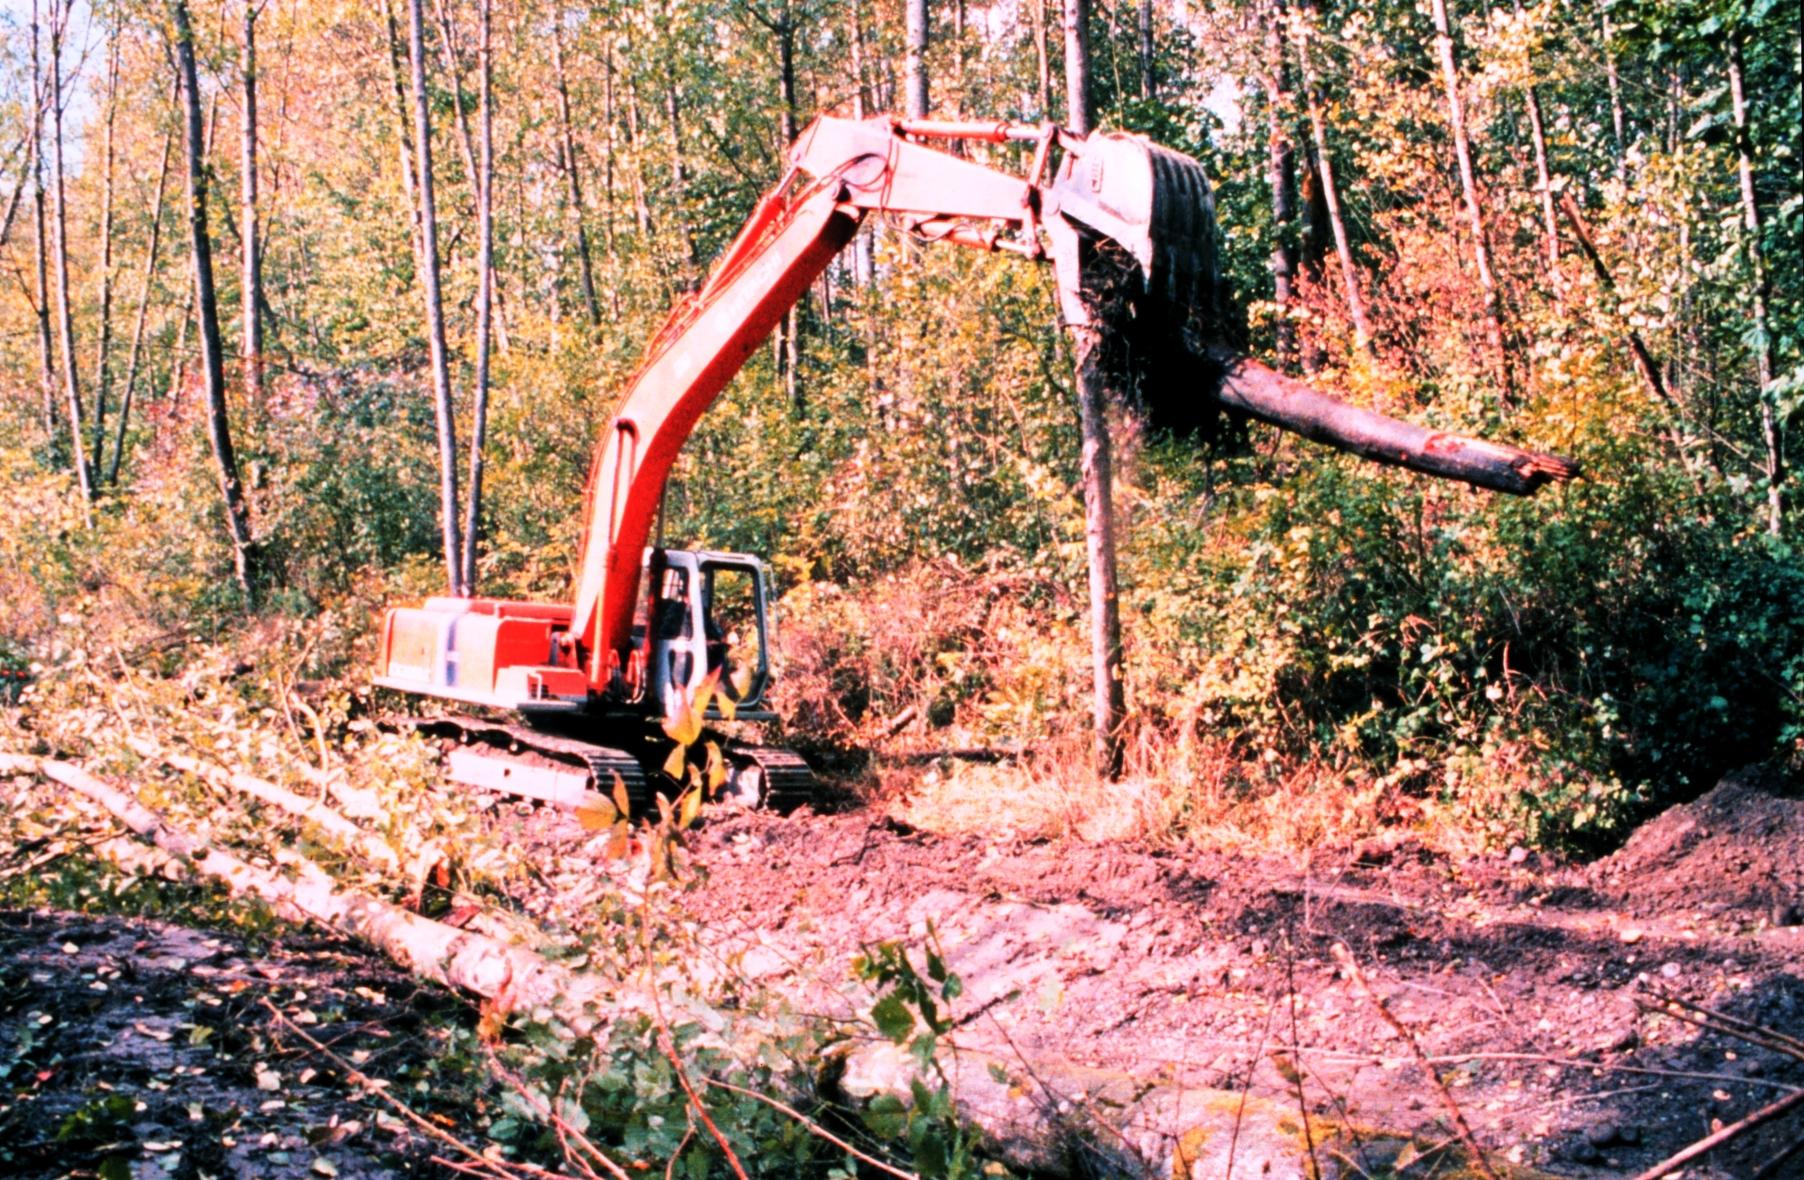 File:Hitachi excavator jpg - Wikimedia Commons